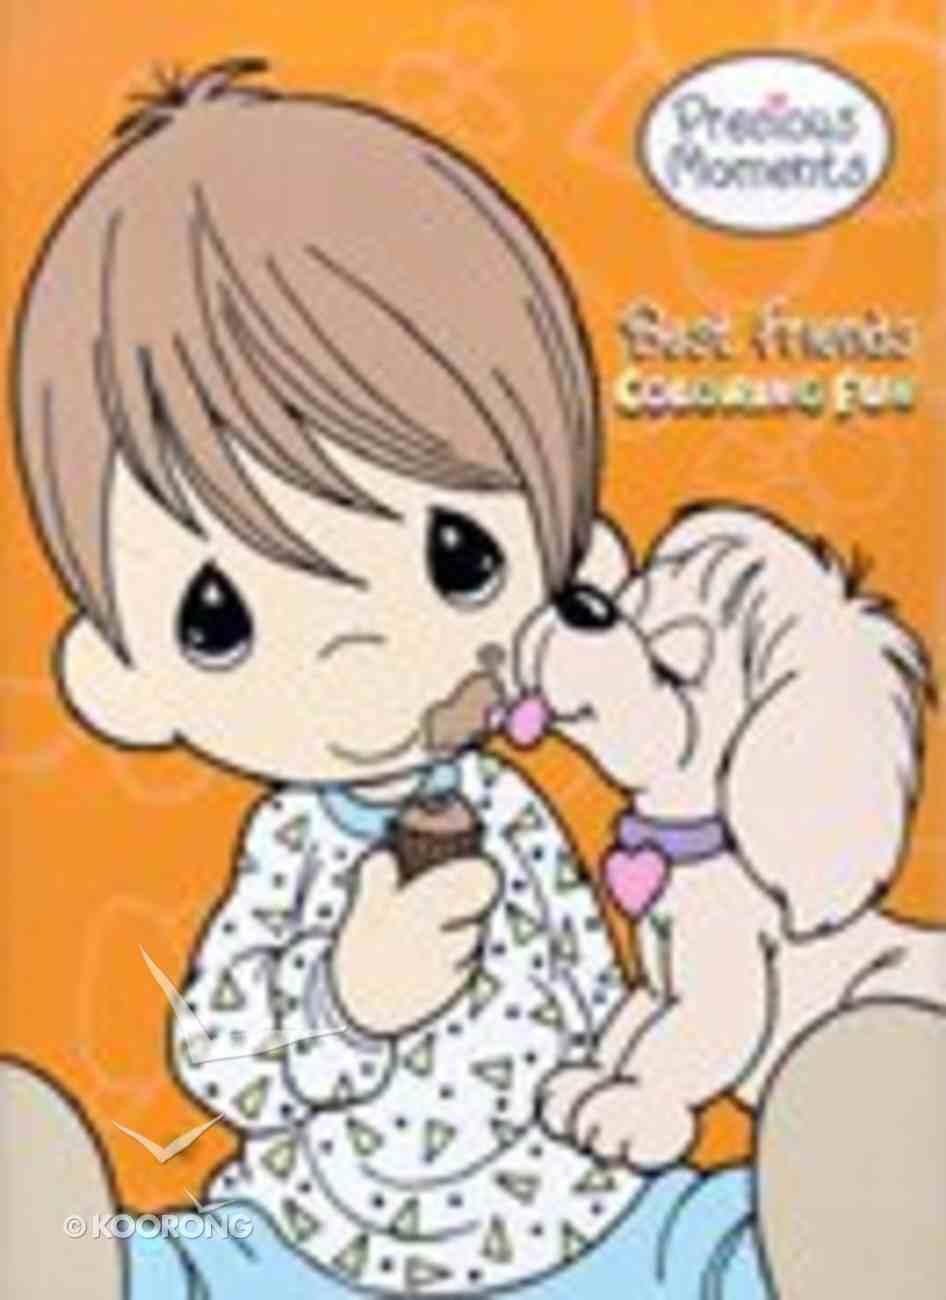 Best Friends Coloring Fun (Precious Moments) (Golden Books Series) Paperback